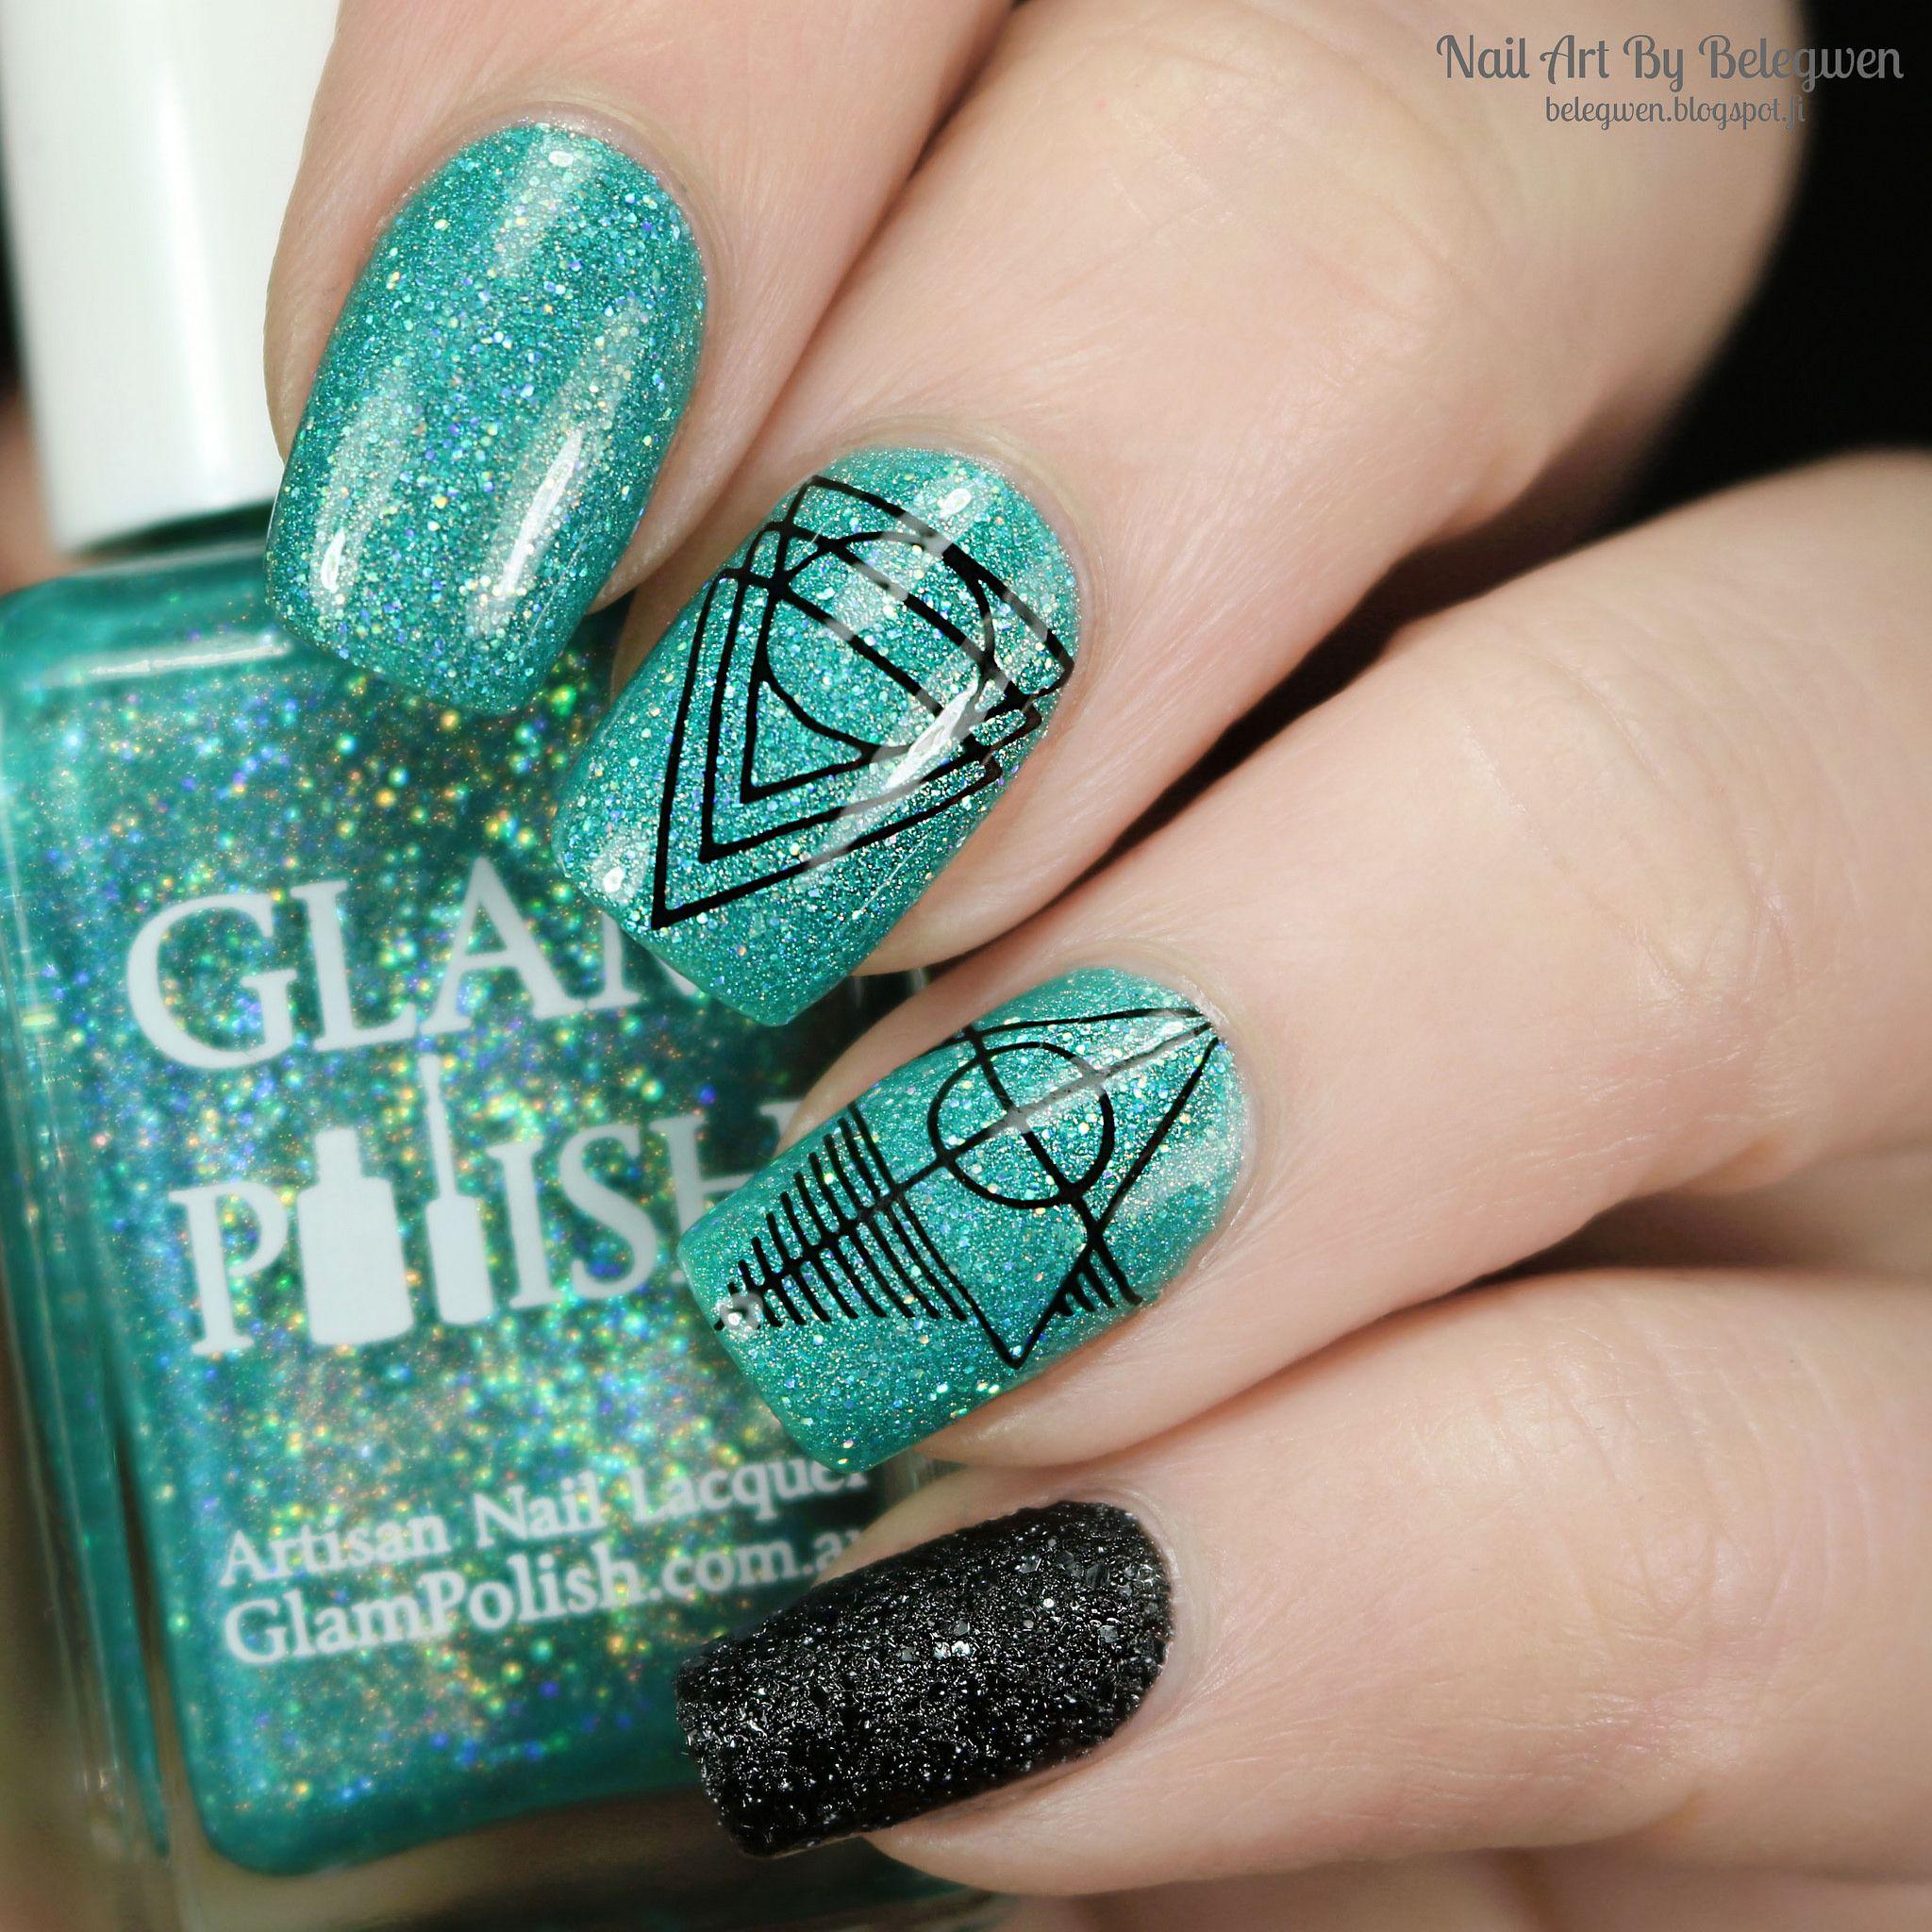 Nail Polish With Glitter Underwear  499b2e79b